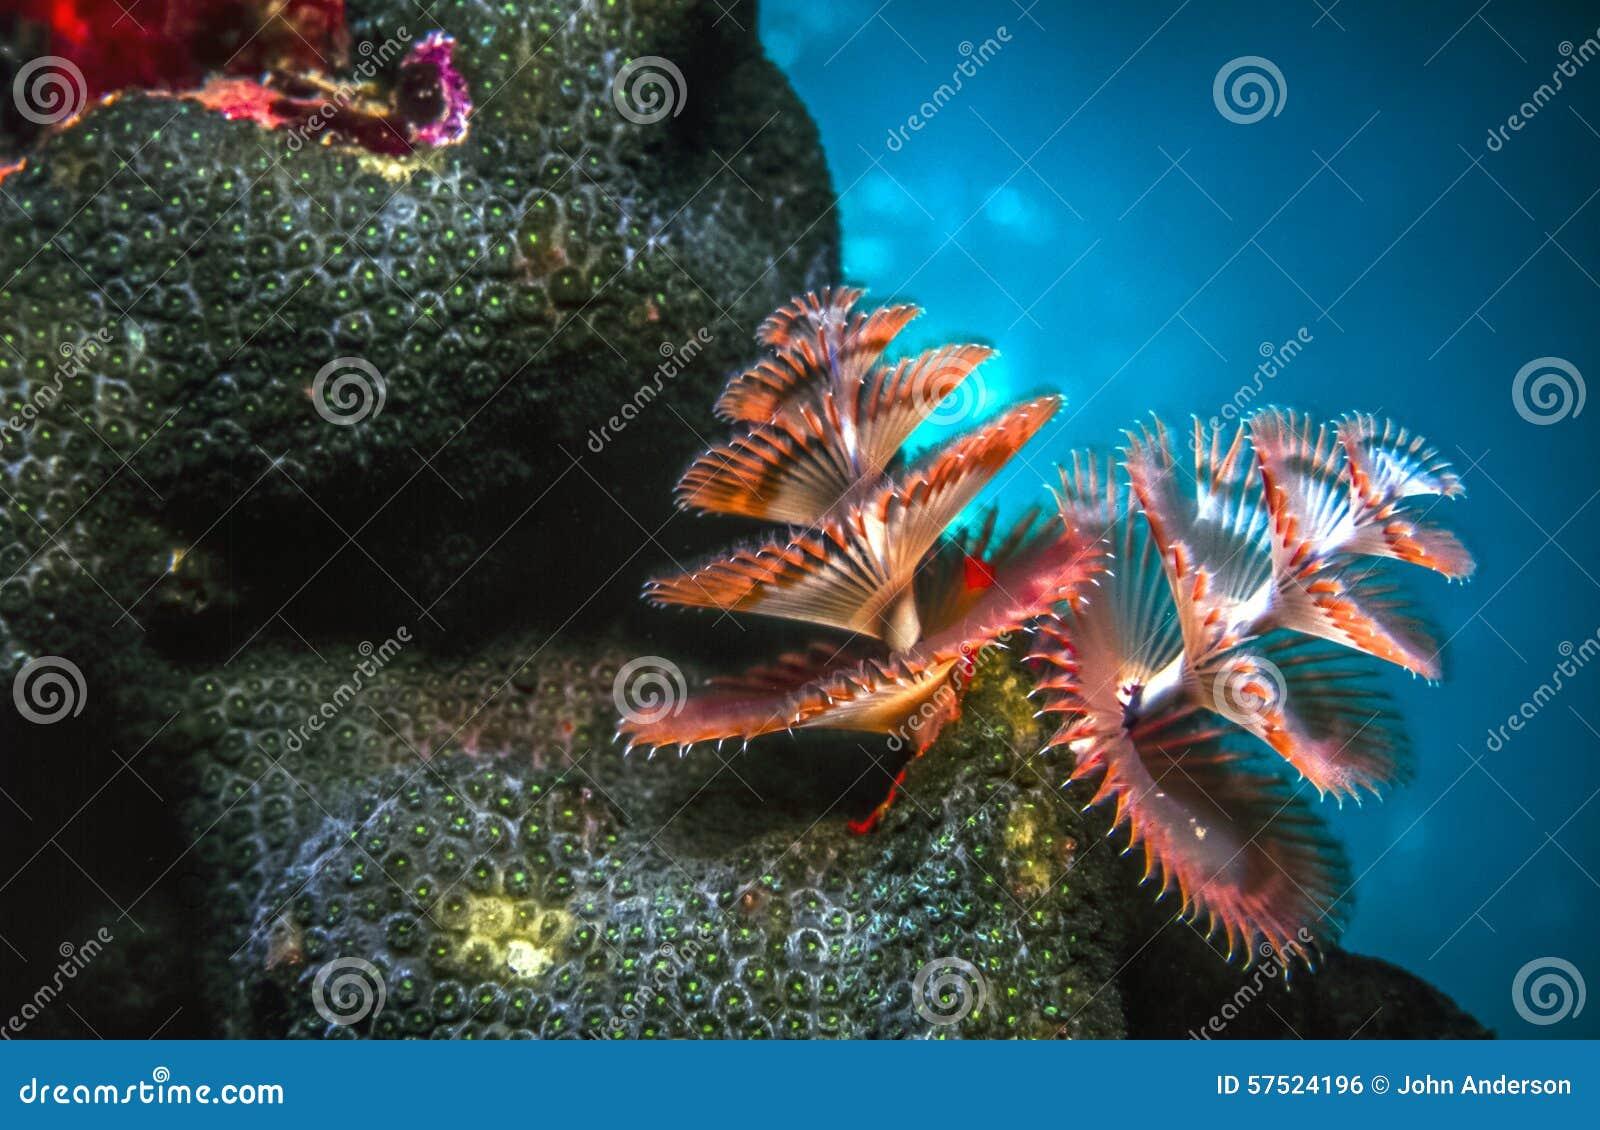 Giganteus Spirobranchus, σκουλήκια χριστουγεννιάτικων δέντρων